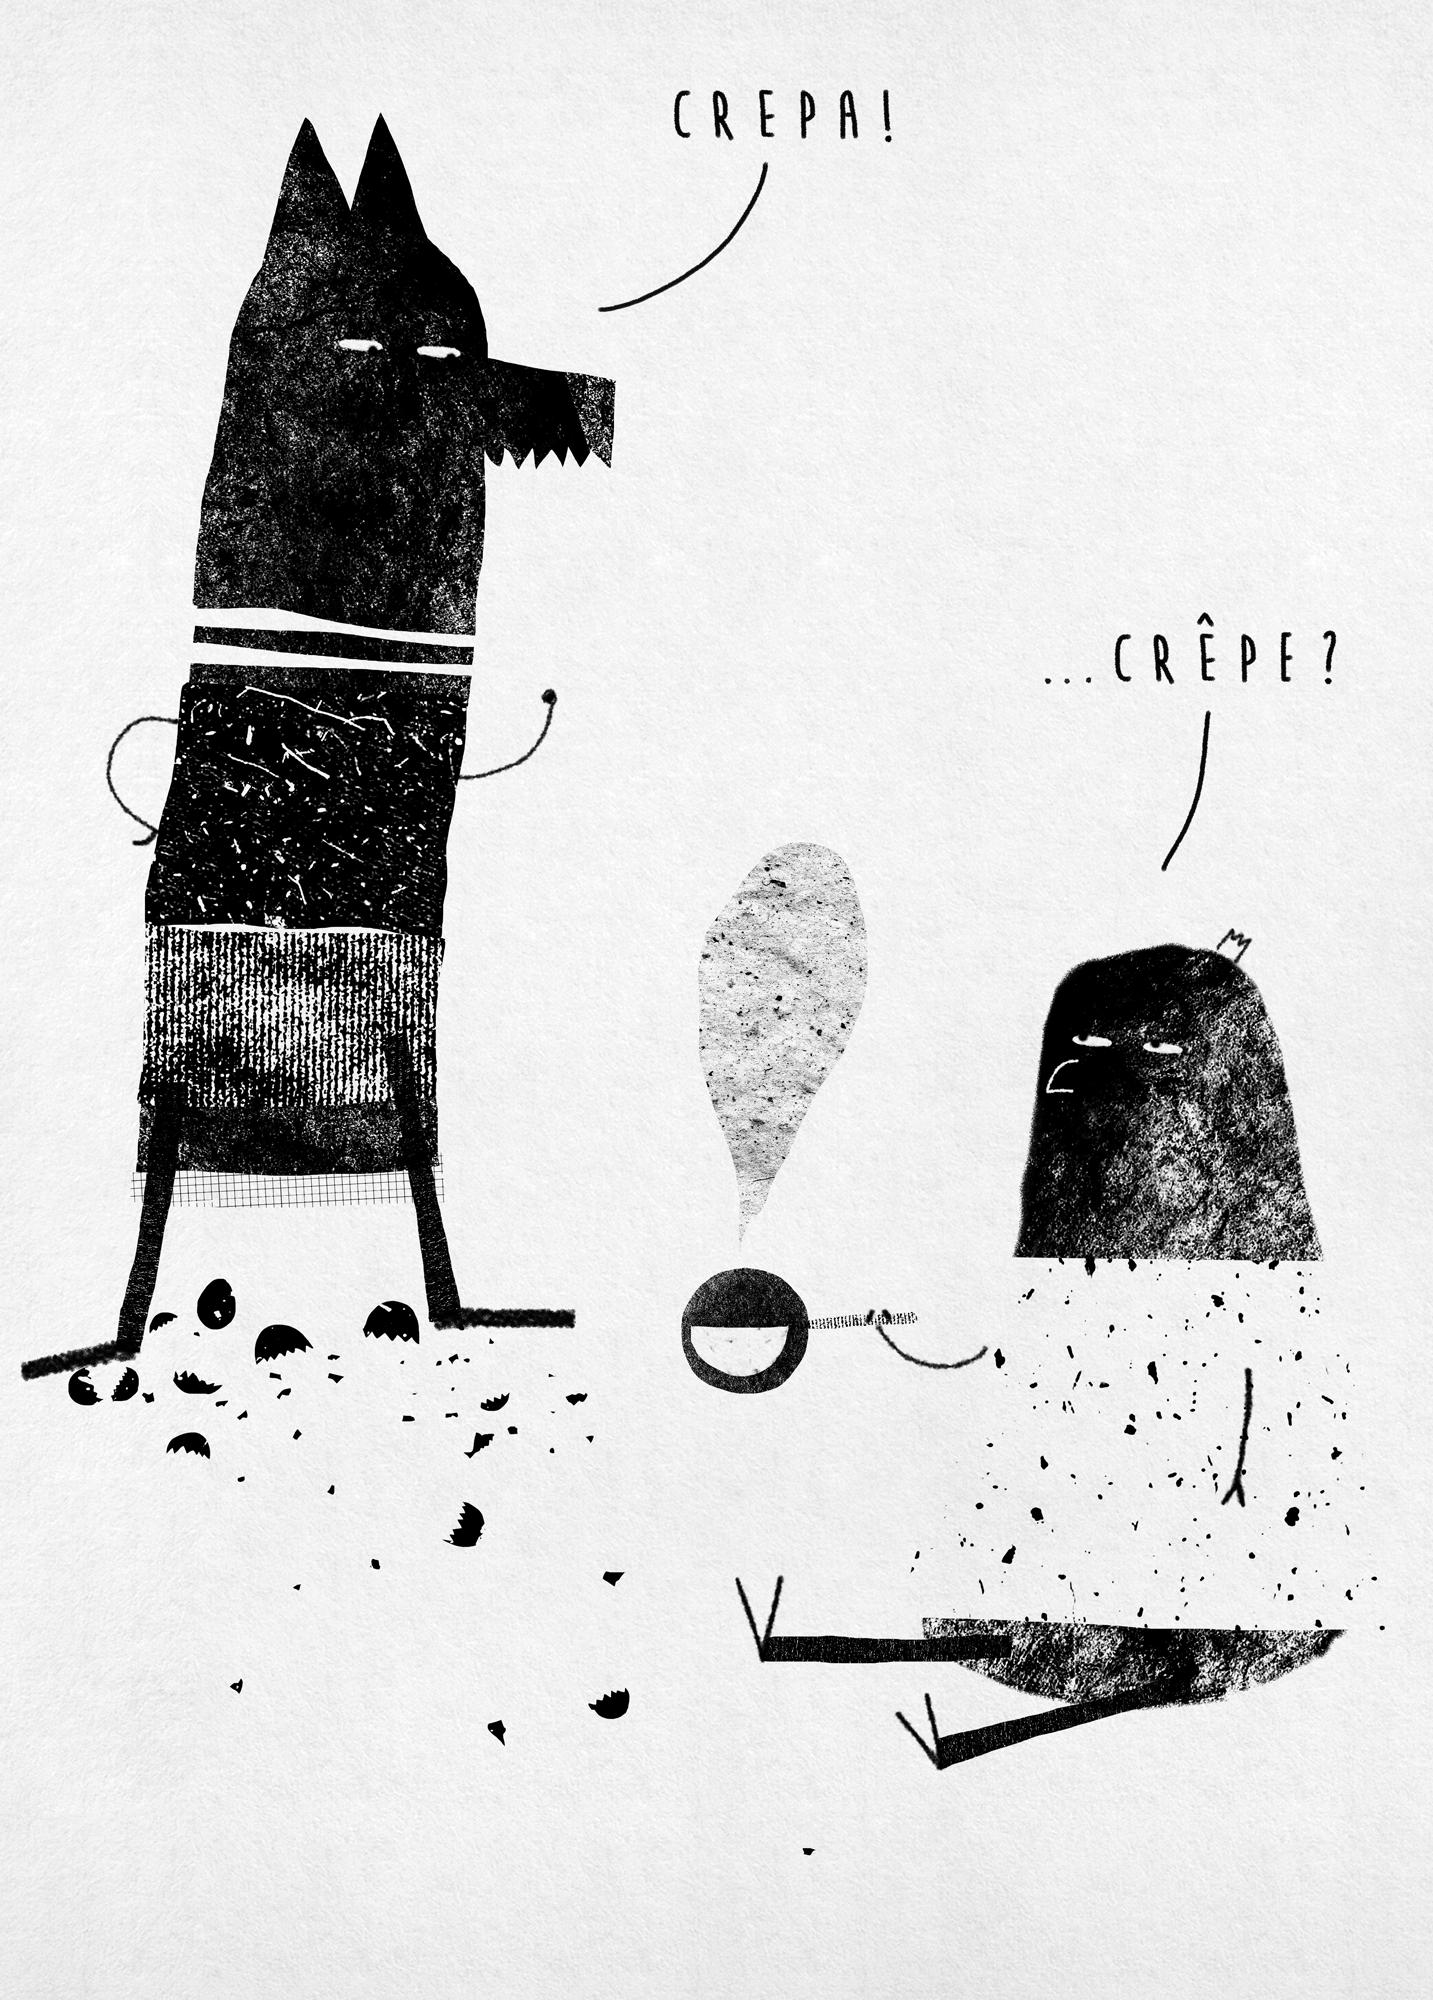 CREPE---CCFF19---Crêpe-(2000).png